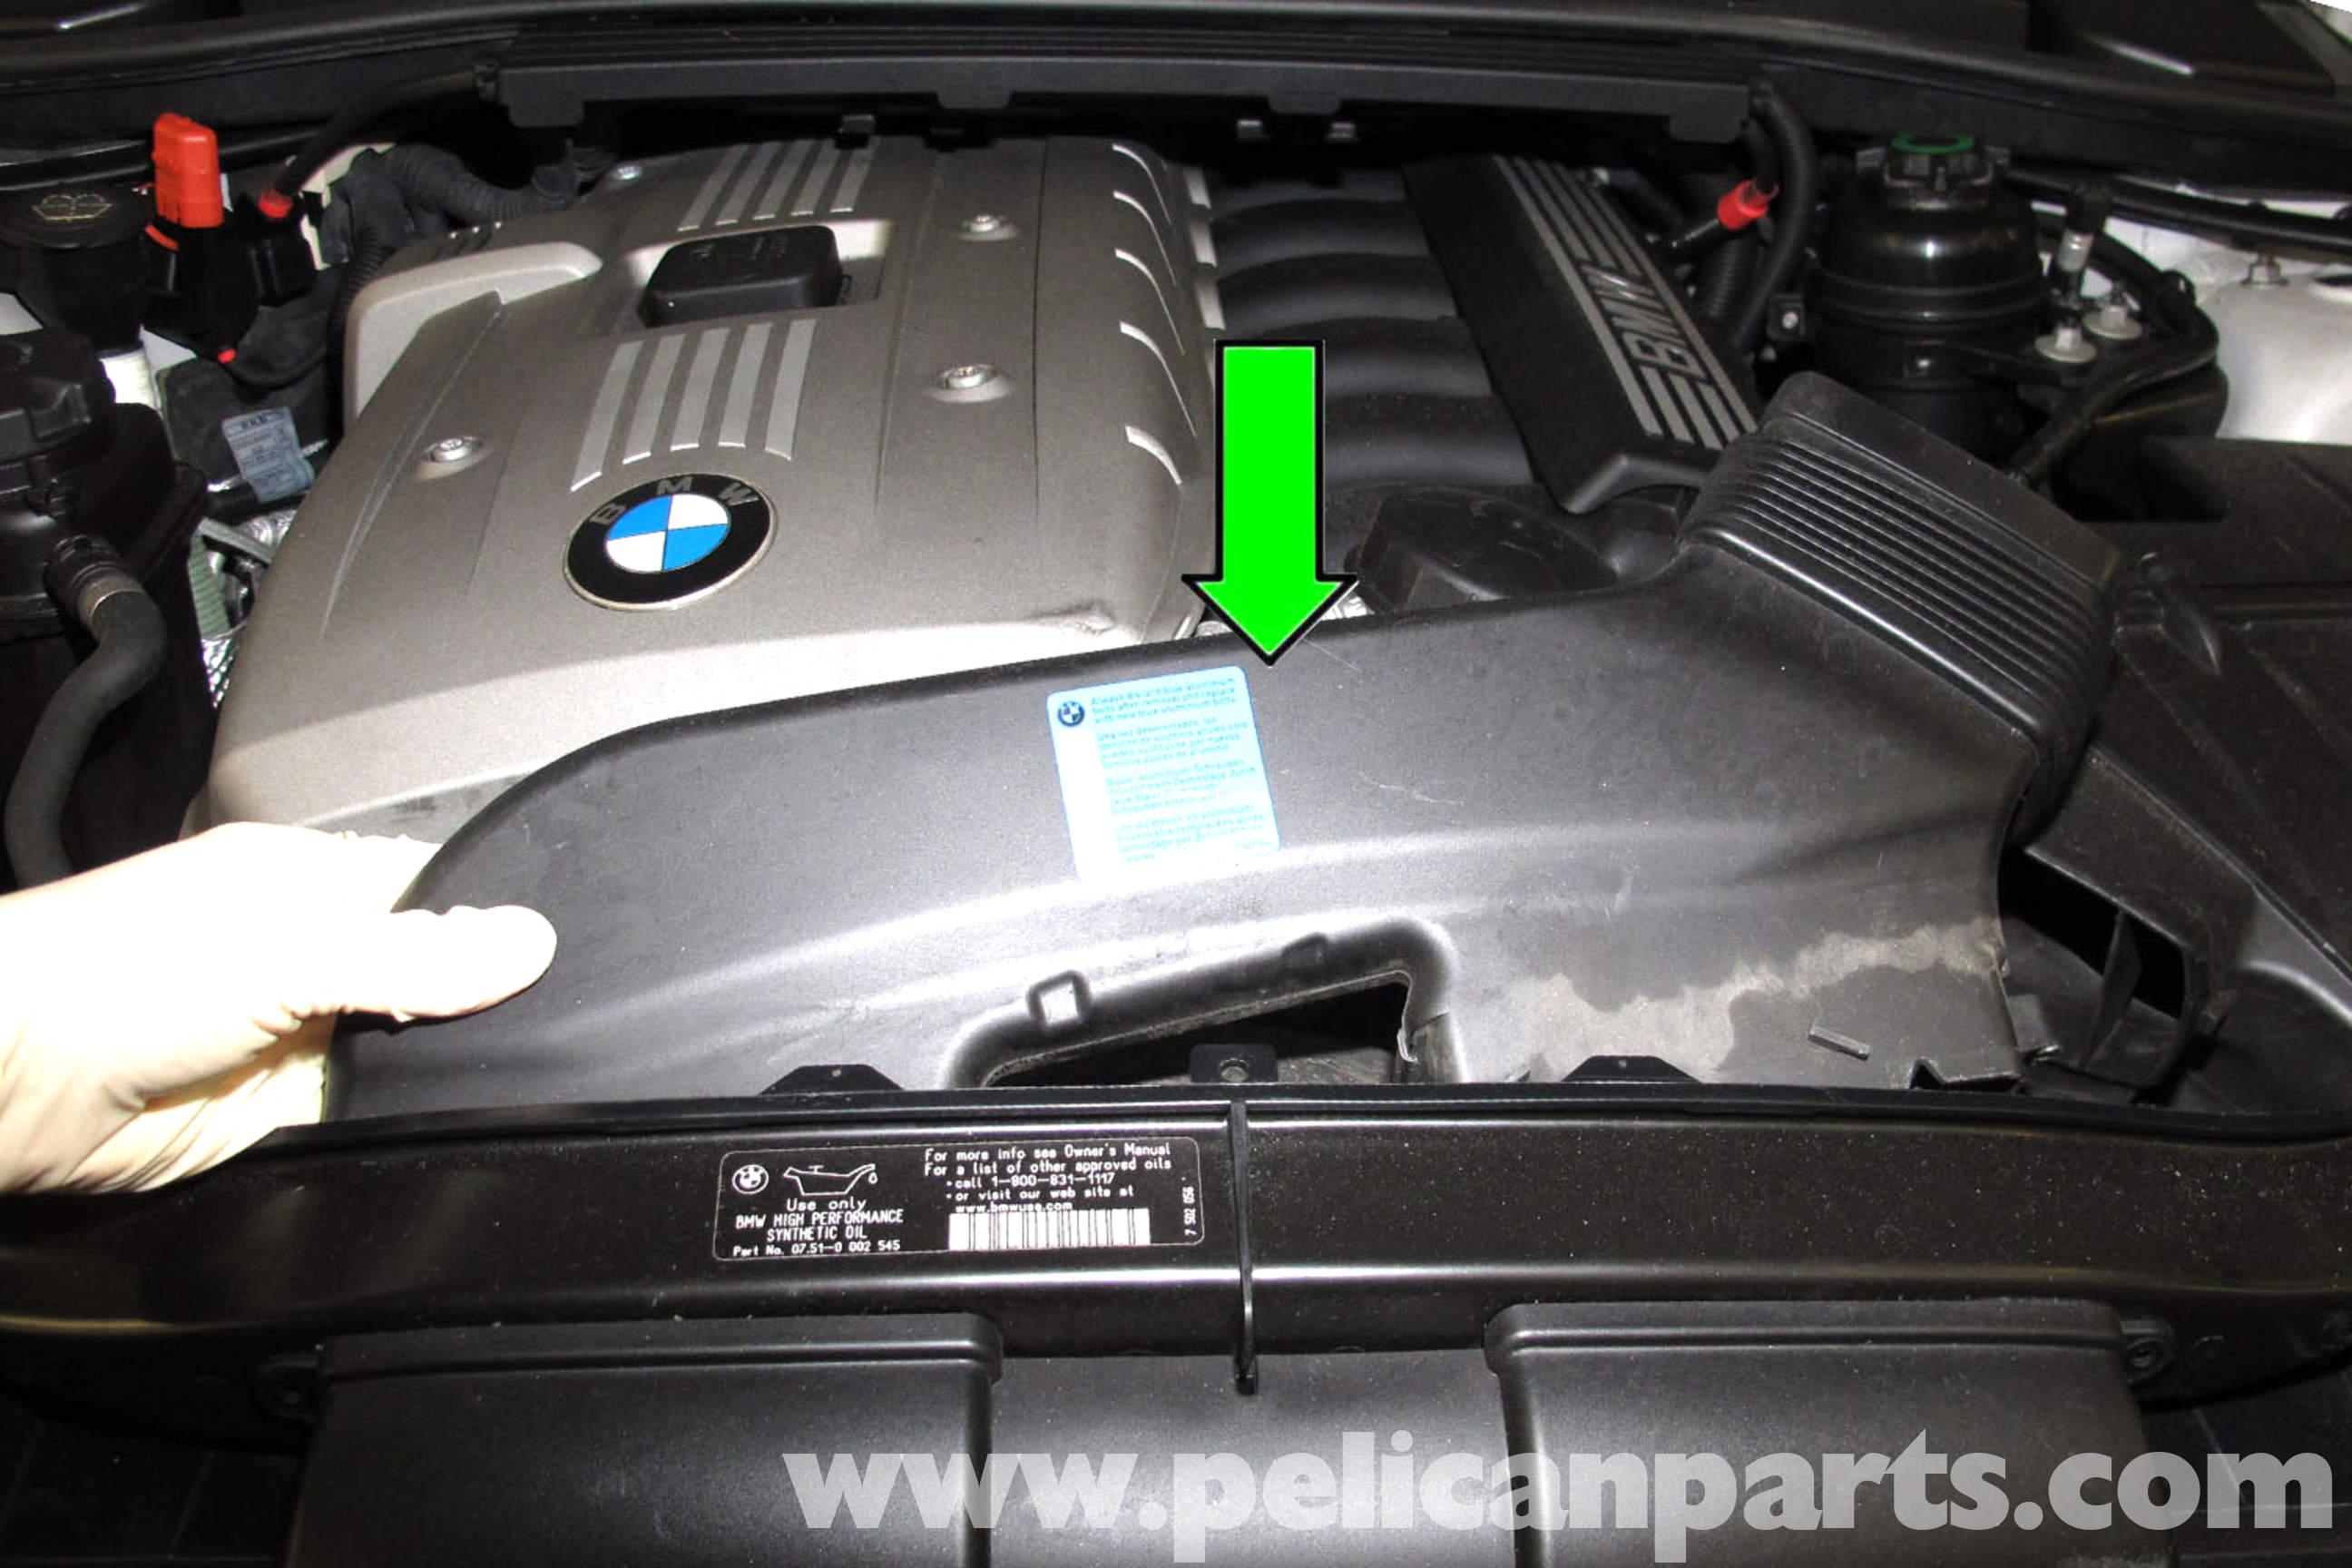 bmw v6 engine diagram 2003 [ 2592 x 1728 Pixel ]